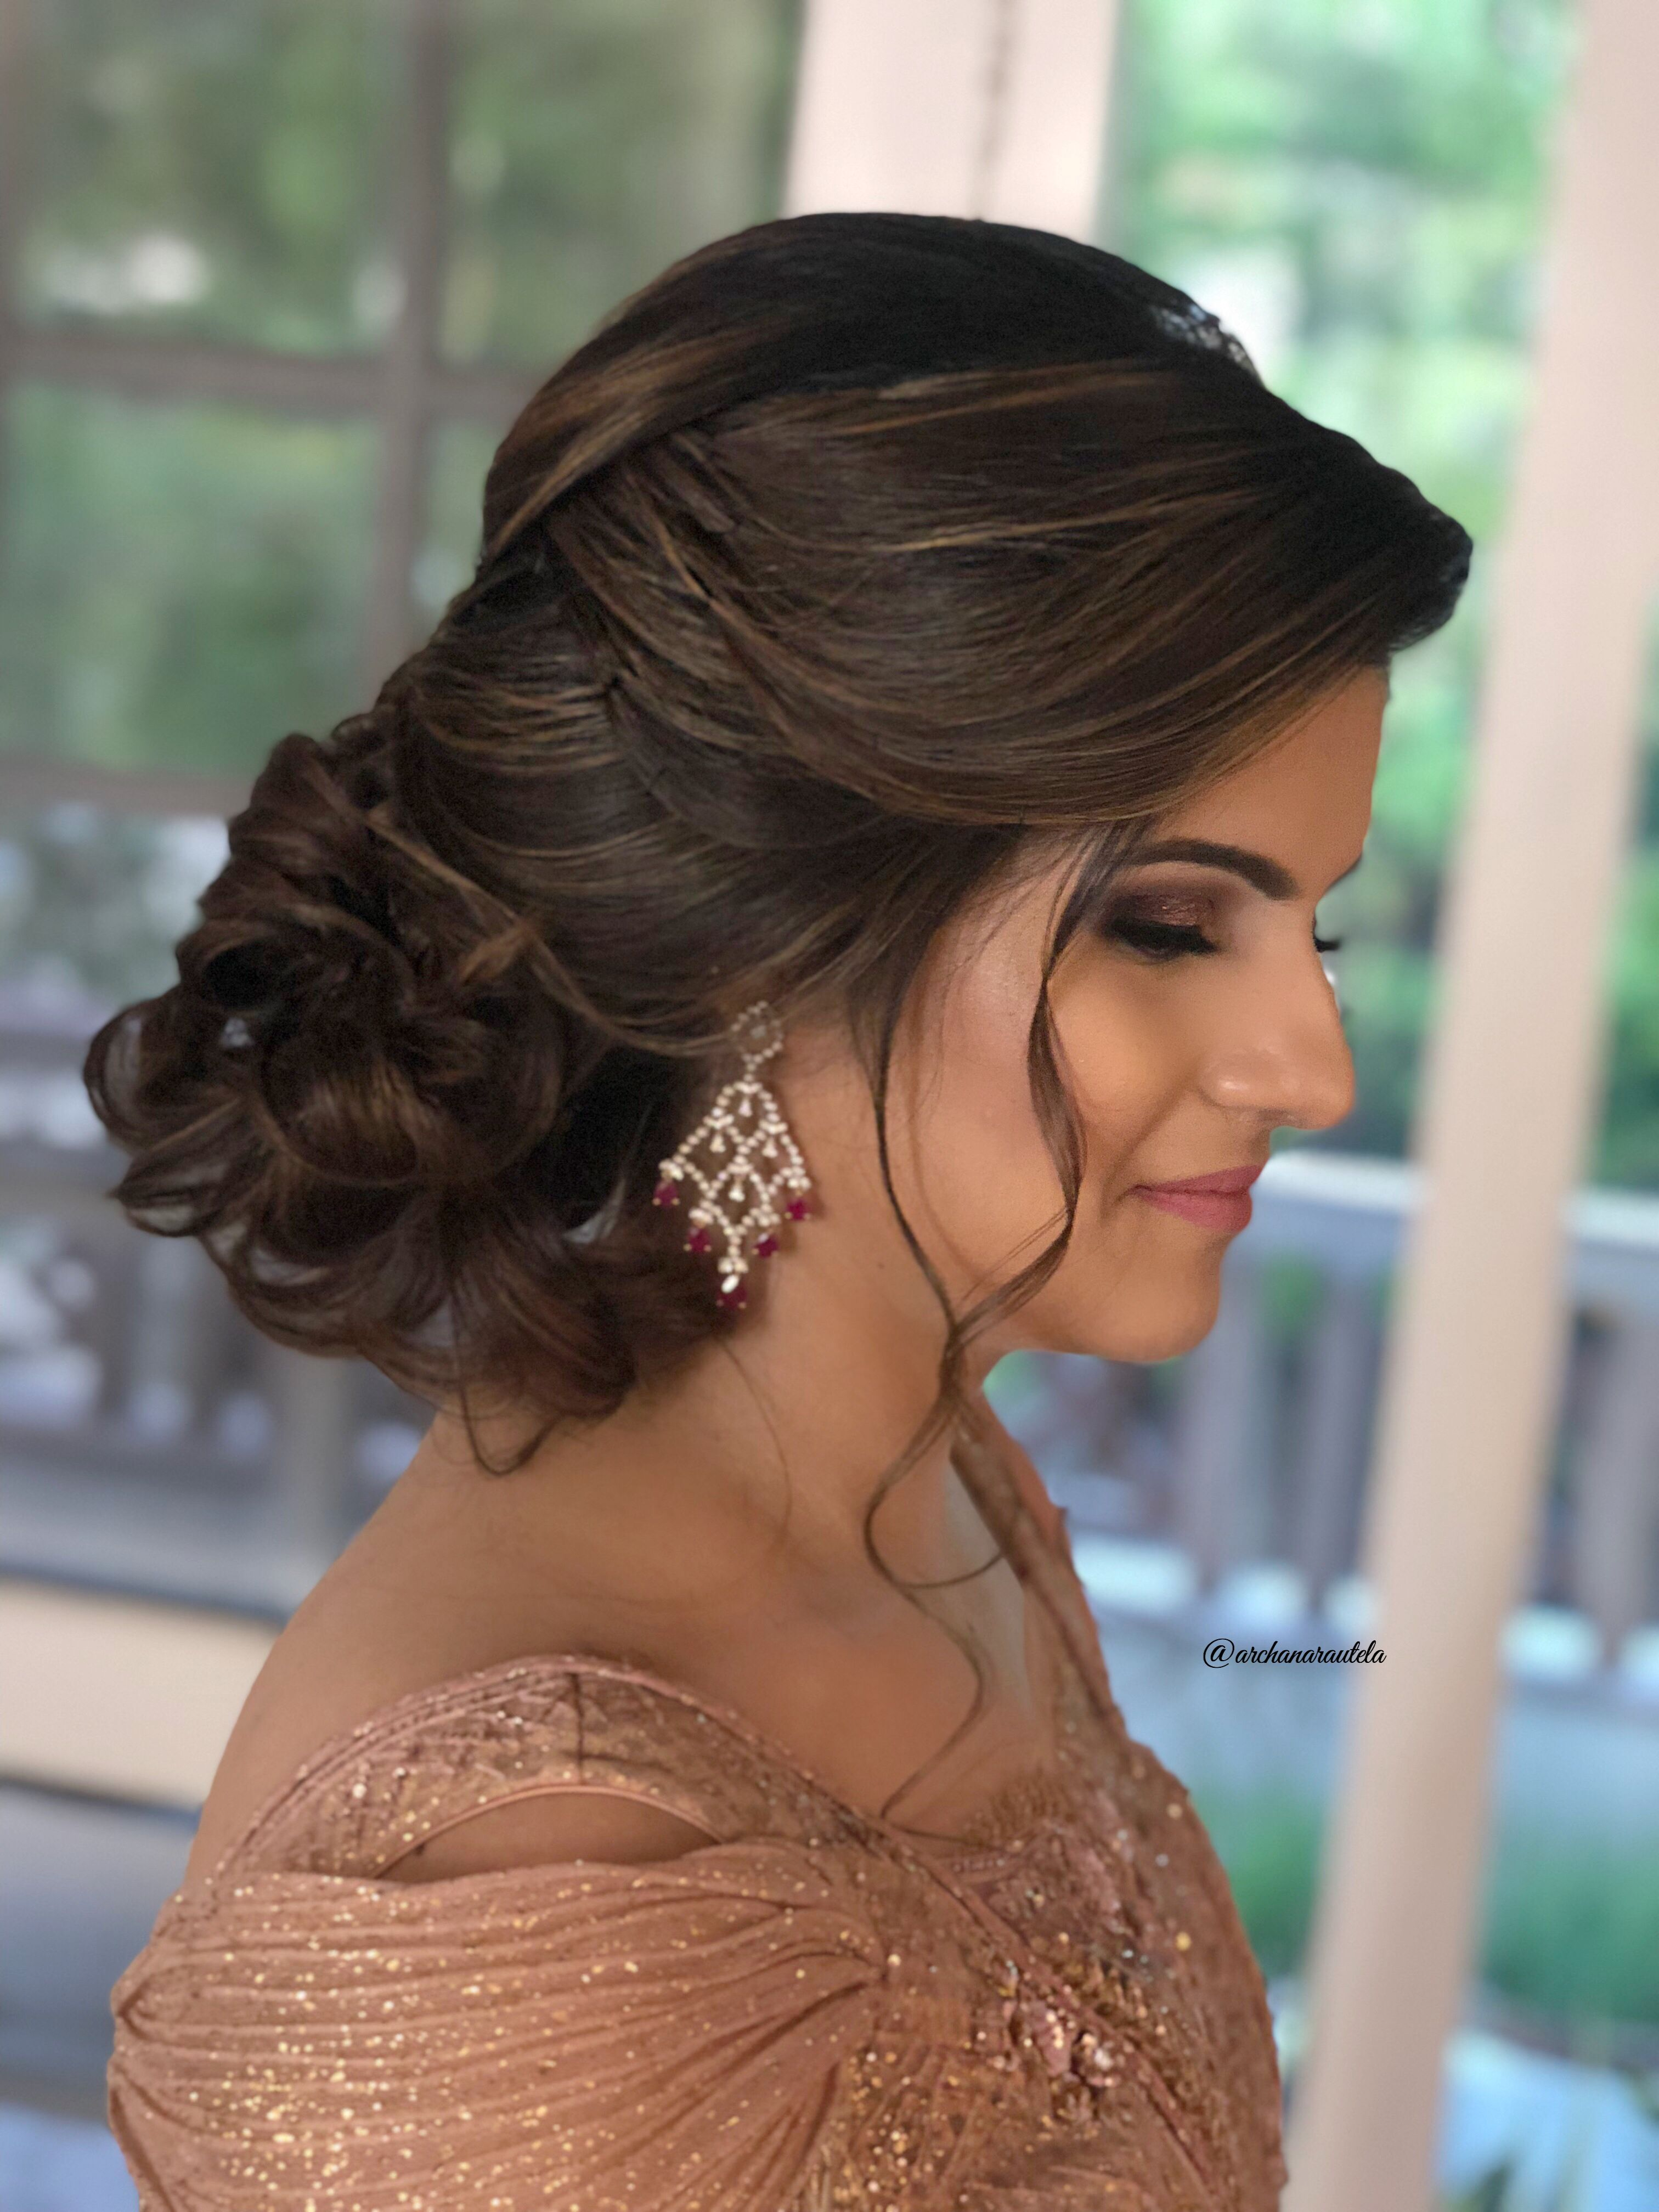 elegance 🌟⭐💋💋⭐🌟 hairdo softly tied #archanarautelahair